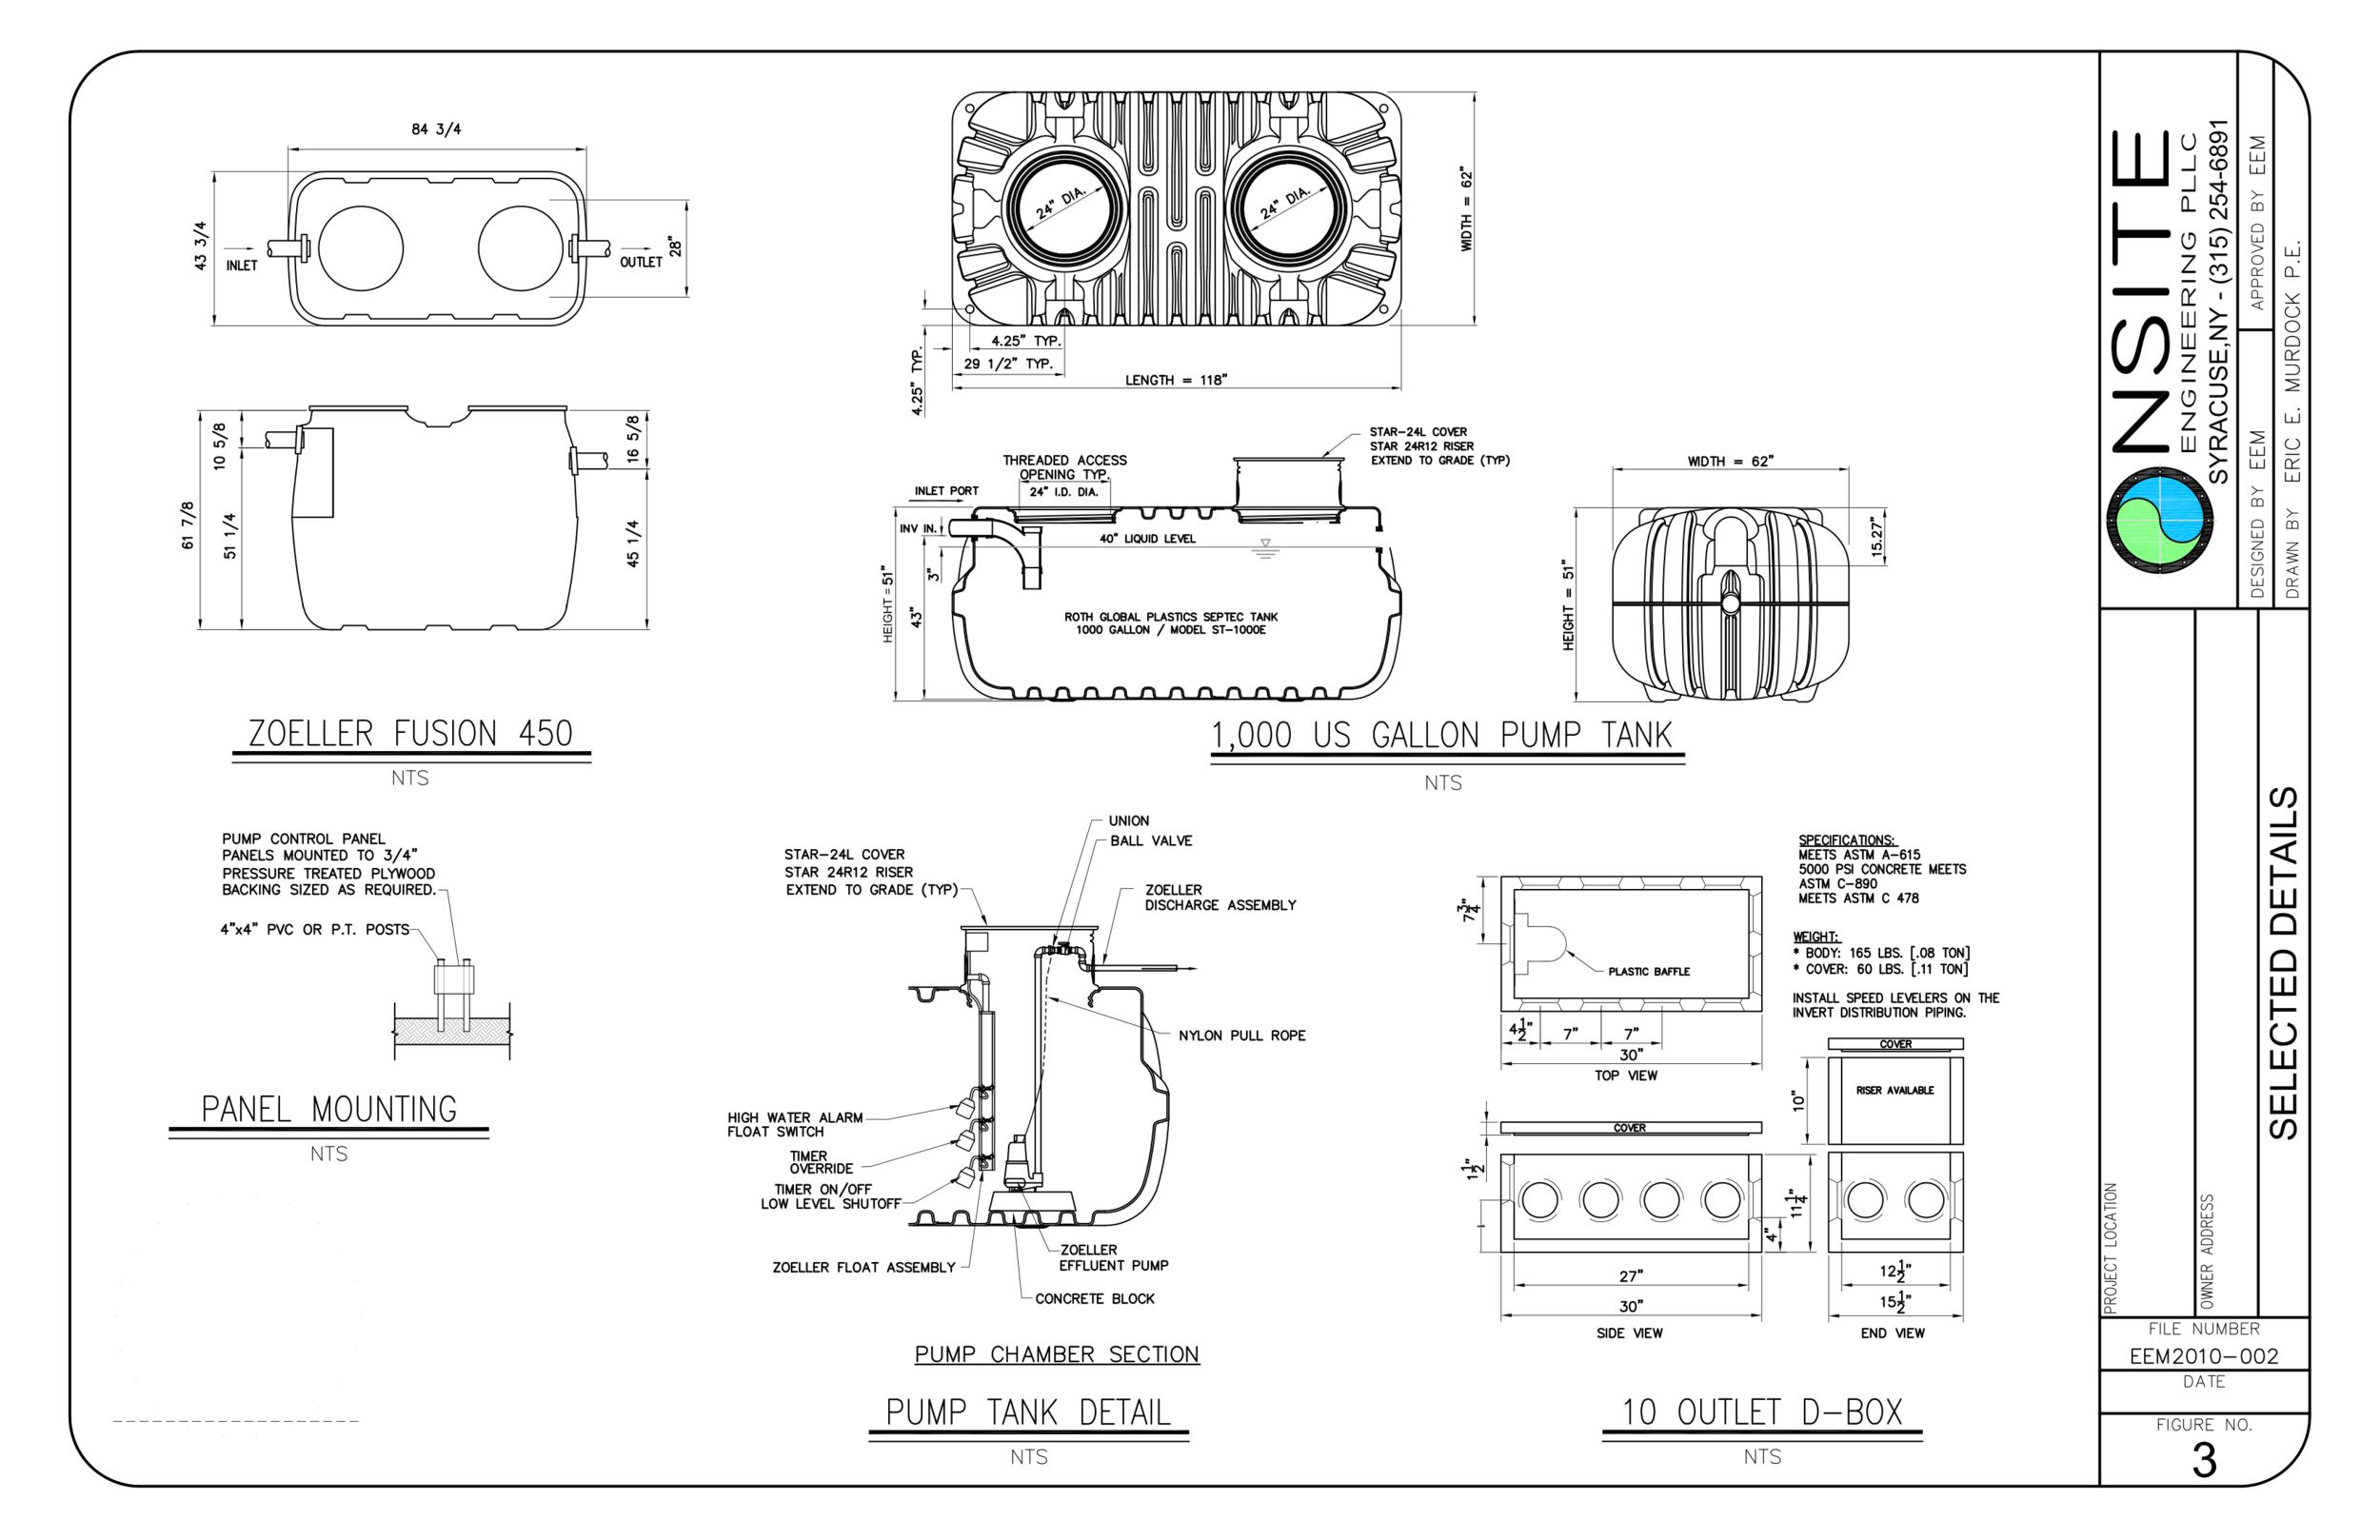 Pump Tank / Distribution Box Details